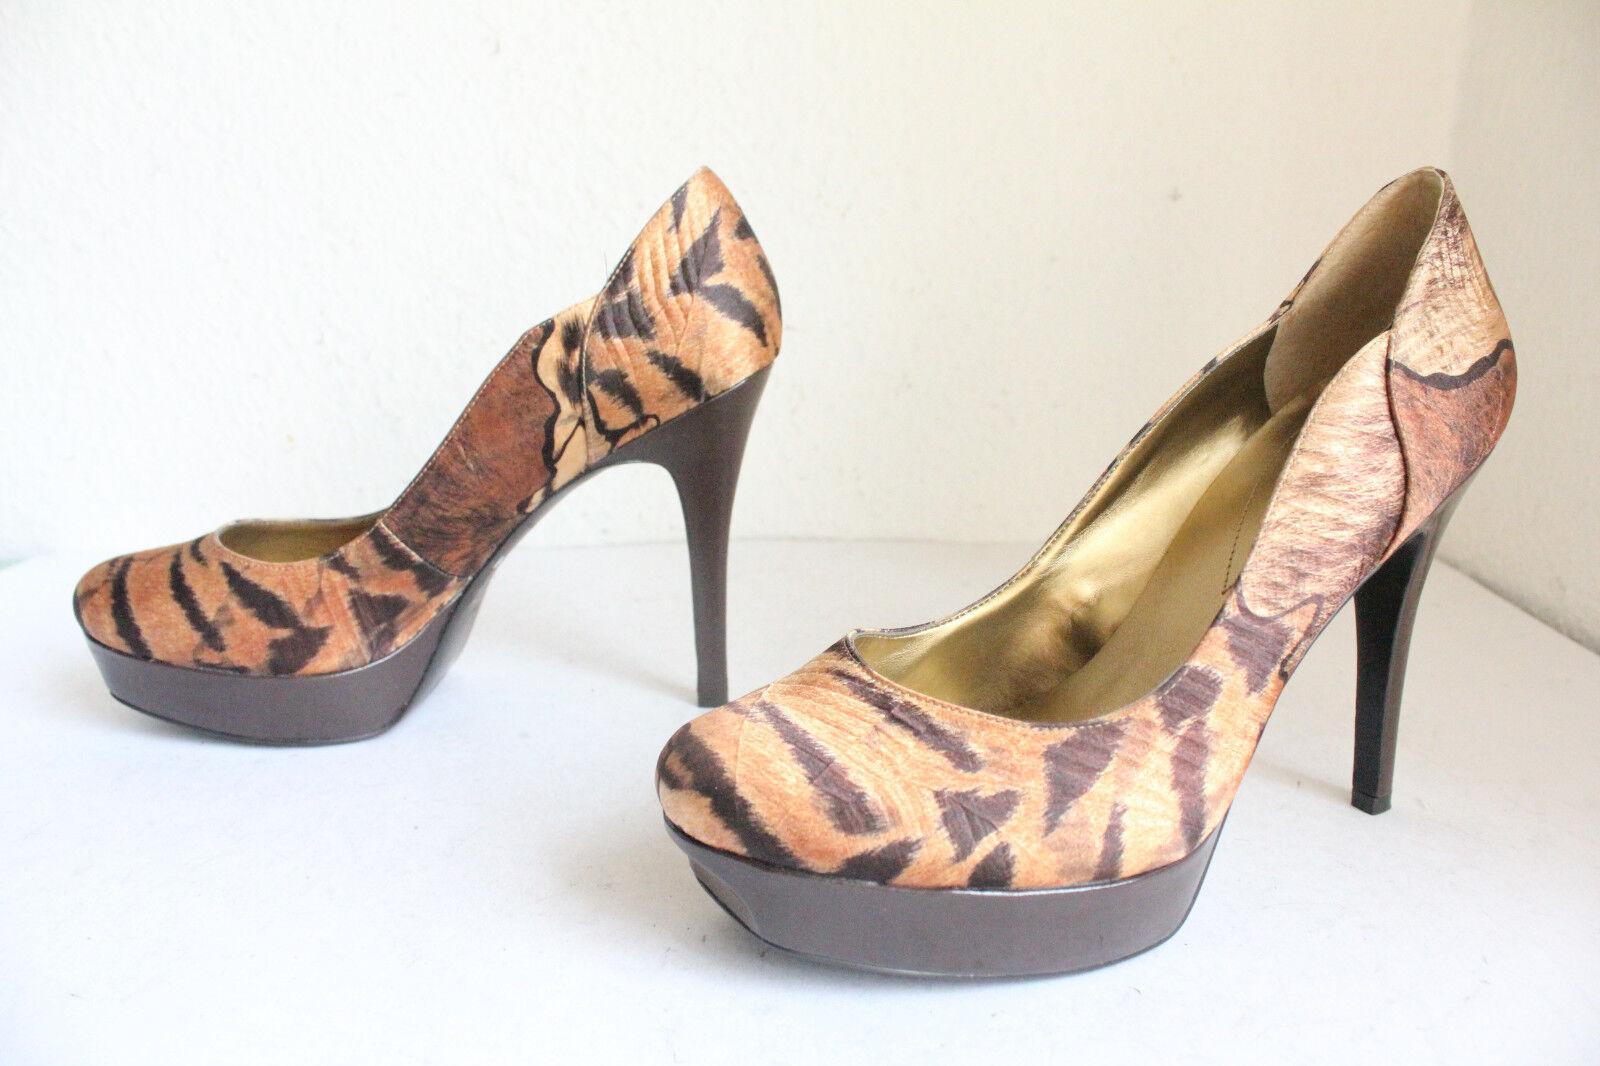 GUESS Luxus Pumps Tigermuster High Heel Pumps Luxus Schuhe Mehrfarbig Eu:41-Us:10M 38d184